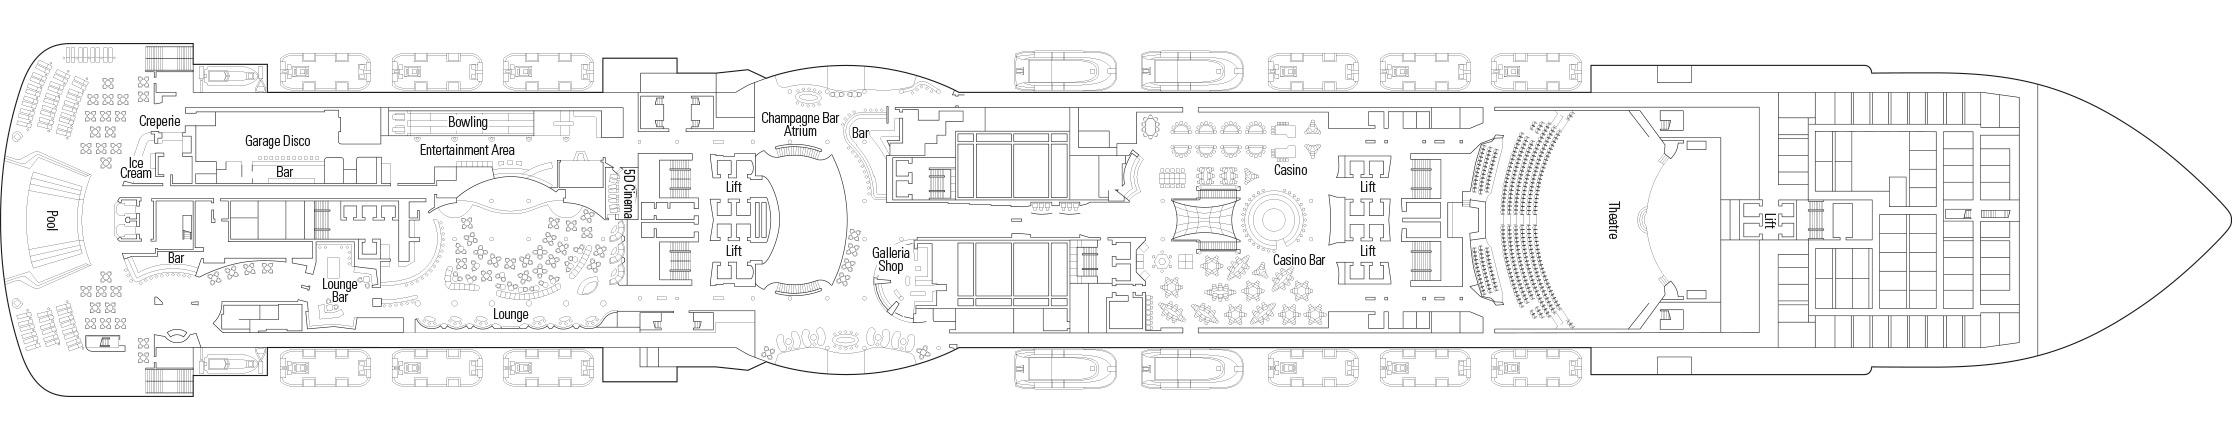 MSC Cruises MSC Seaview Deckplans Deck 7.jpg